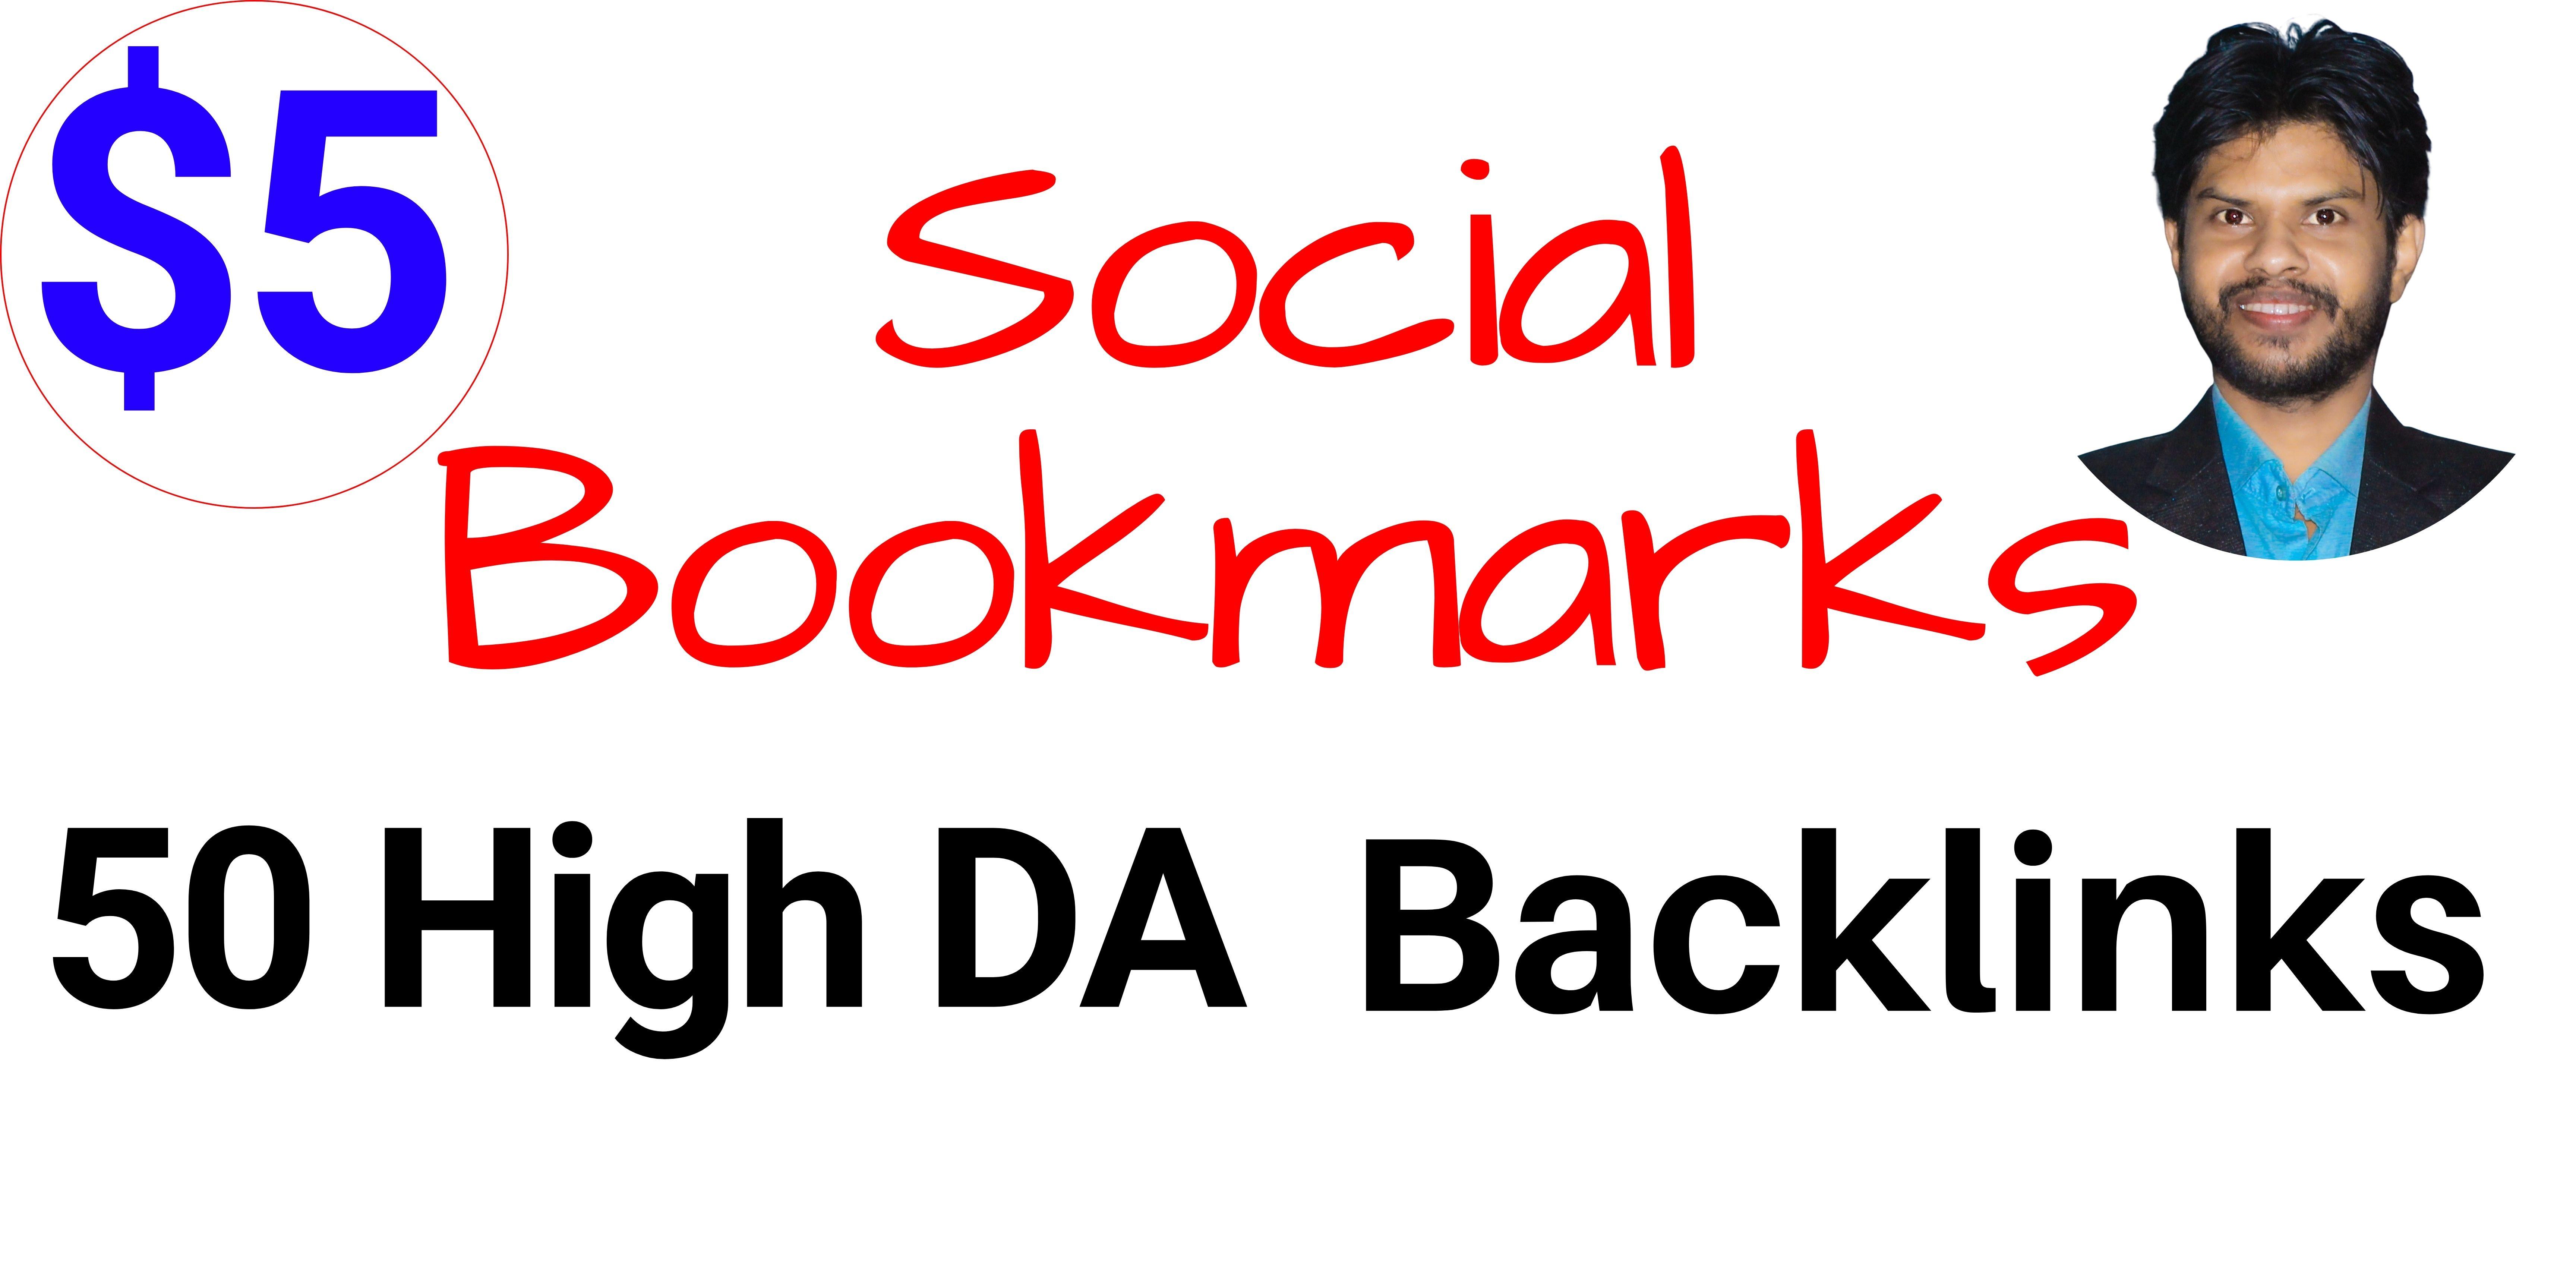 SUPERSTRONG Social Bookmarking High DA80+ Backlinks